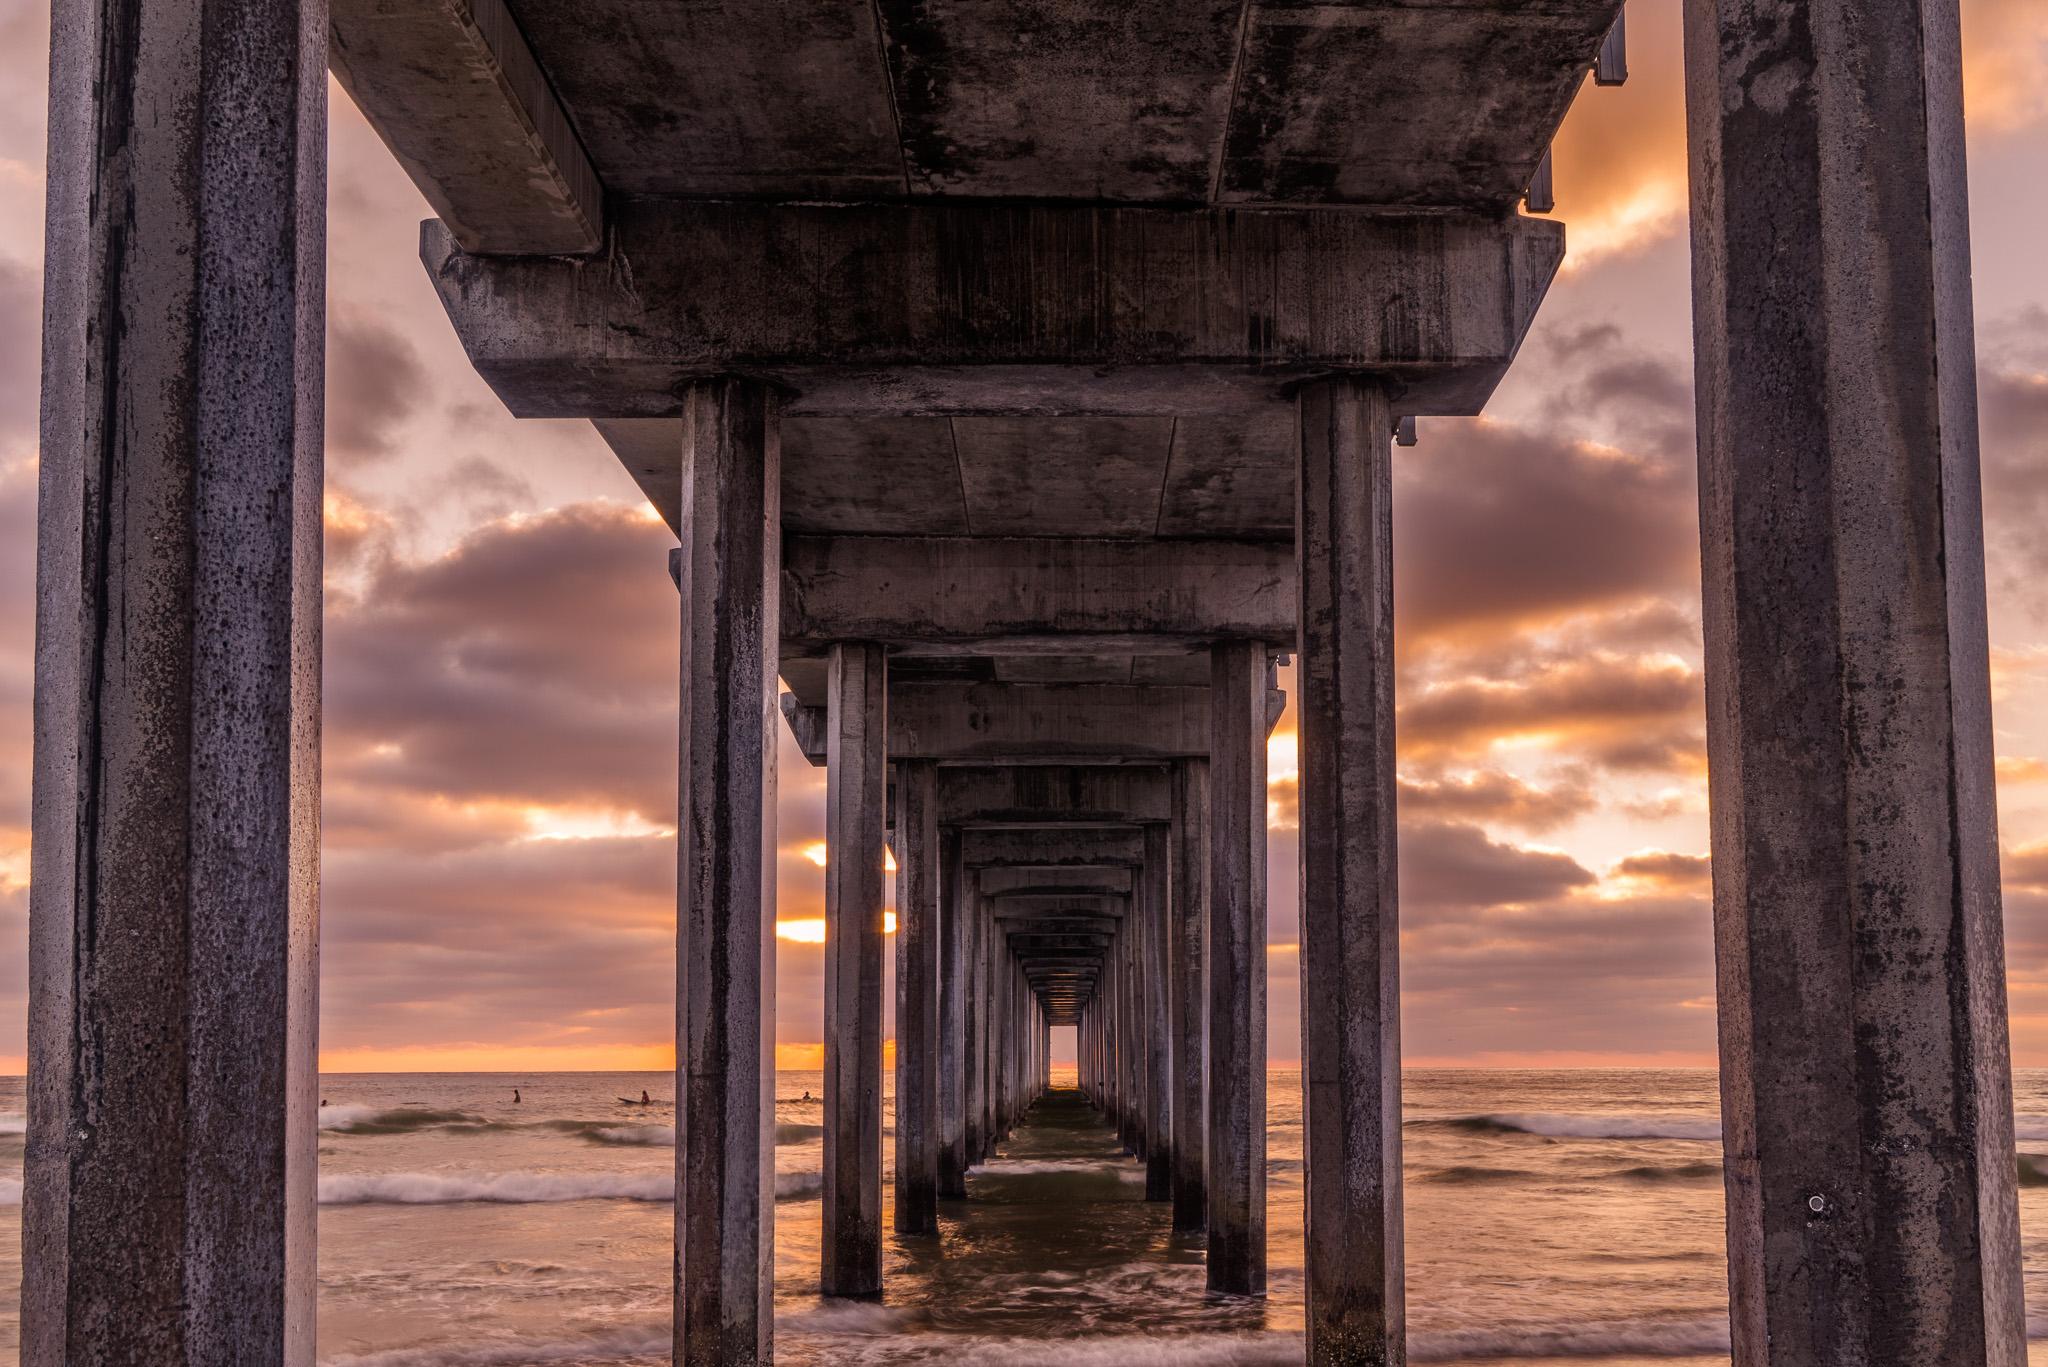 Scott-Davenport-US-California-San-Diego-2016-08-10-0010-4.jpg